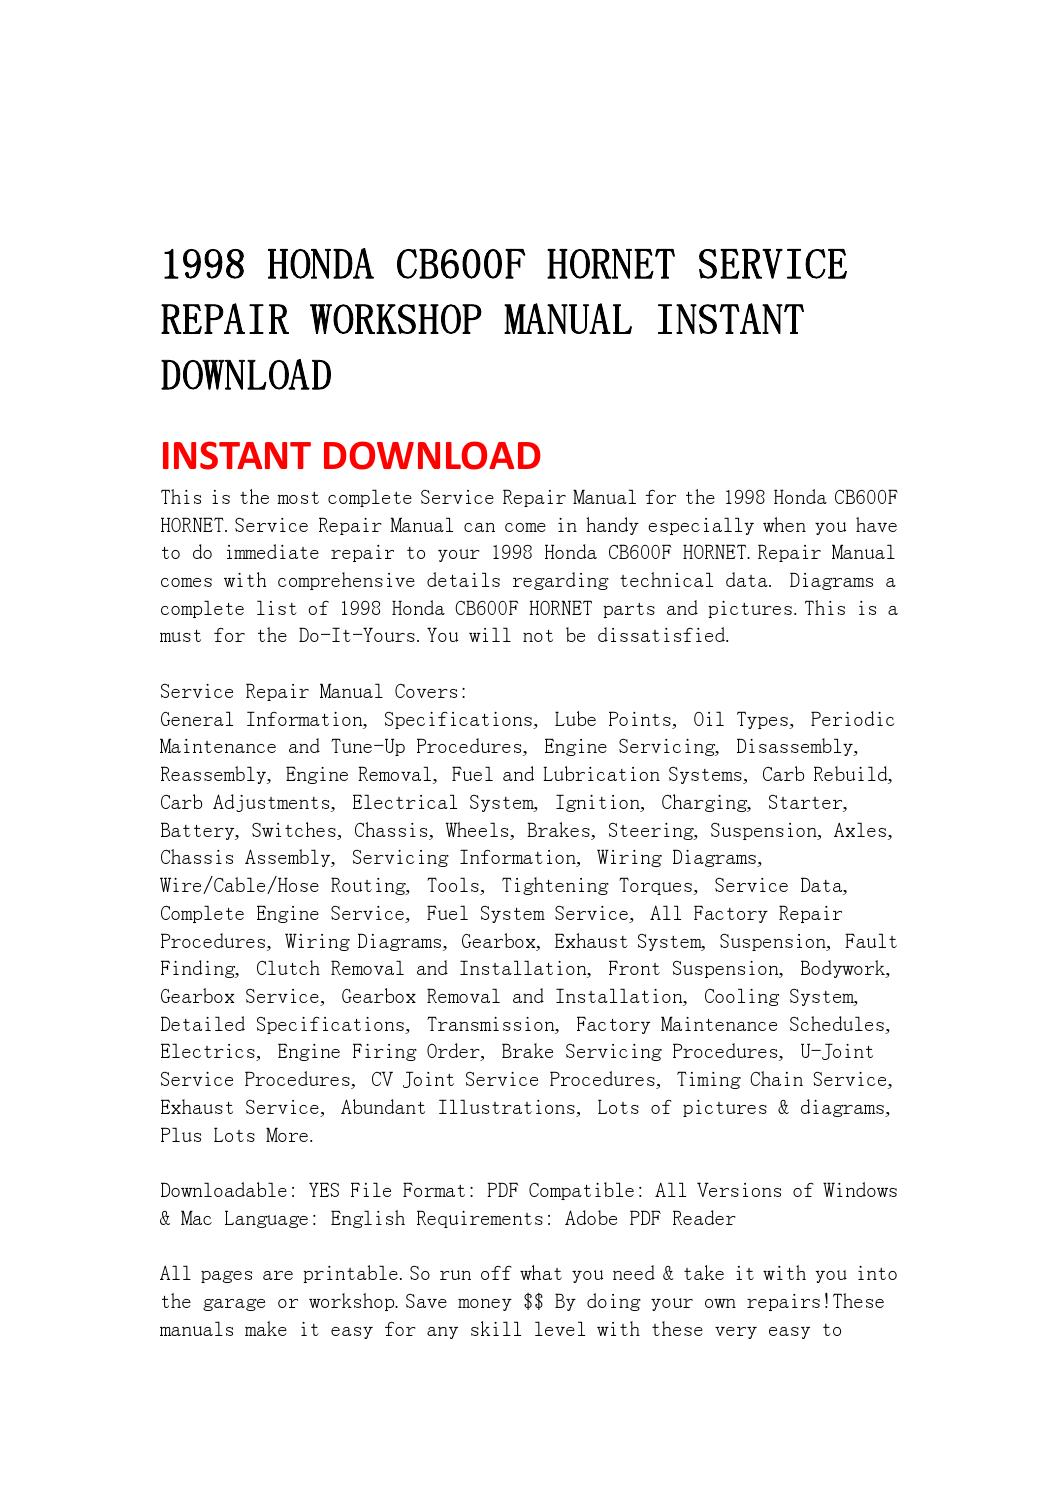 1998 Honda Cb600f Hornet Service Repair Workshop Manual